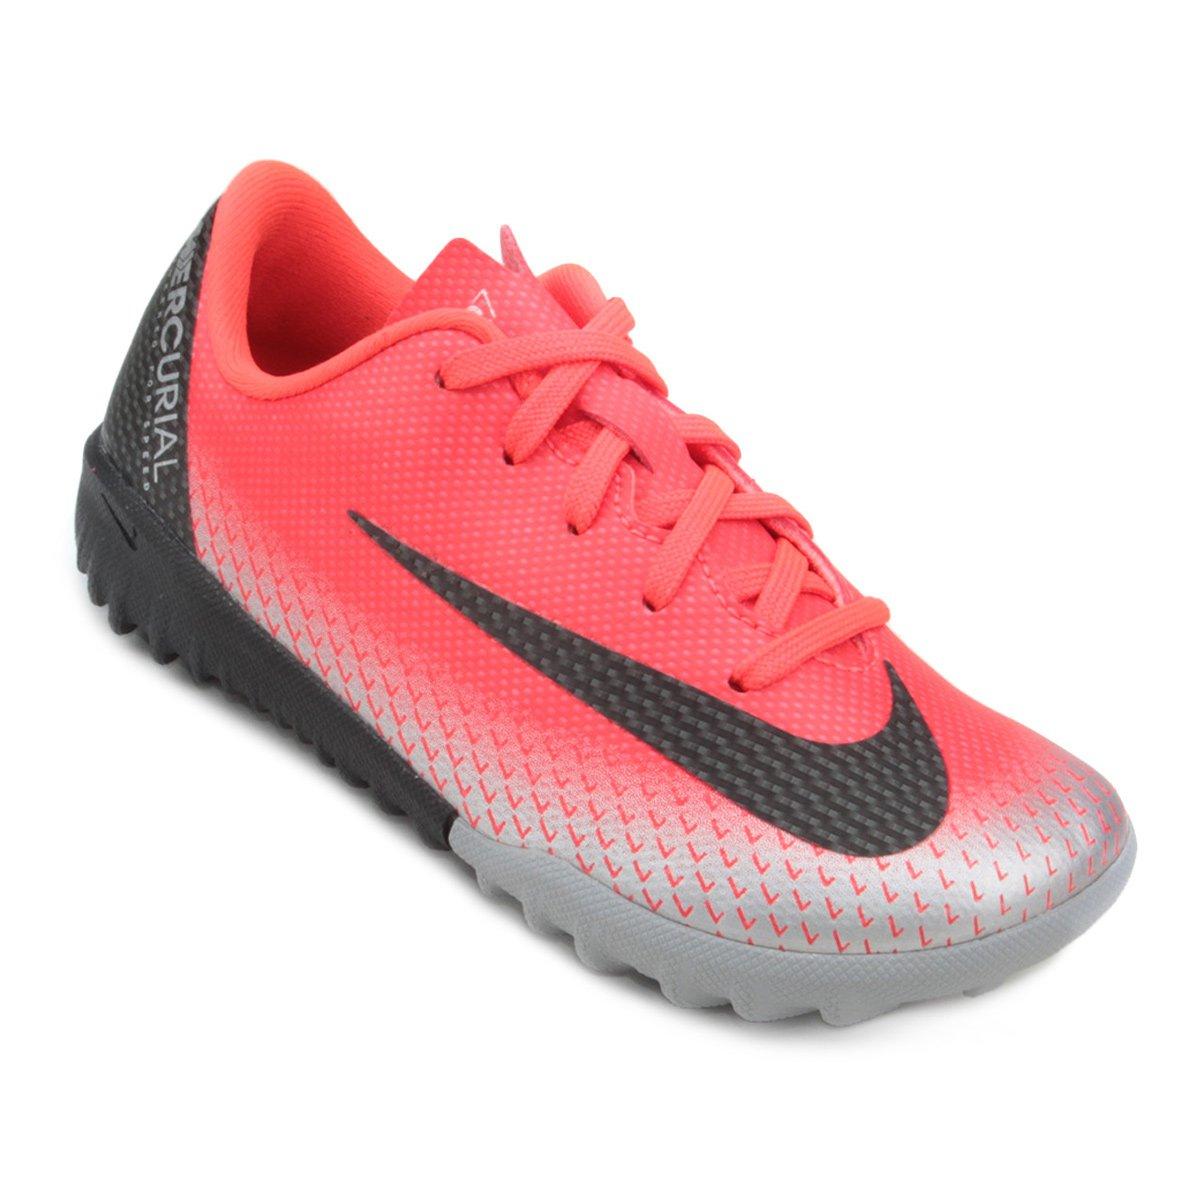 52a0ecaebf Chuteira Society Infantil Nike Mercurial Vapor 12 Academy OS CR7 TF ...